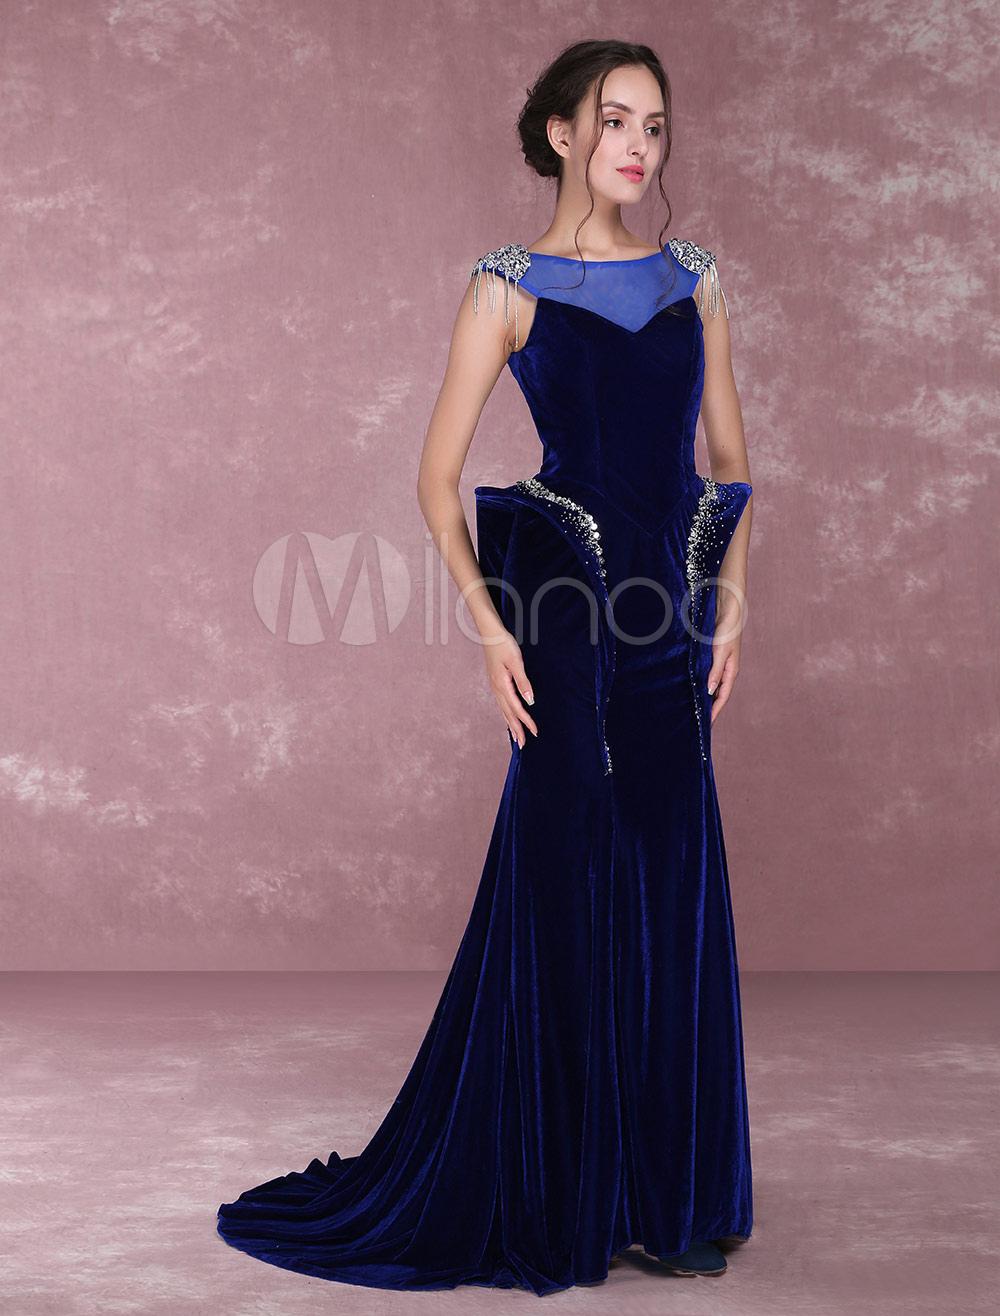 Velvet Evening Dresses Royal Blue Beading Illusion Mermaid Formal Party Dress (Wedding) photo